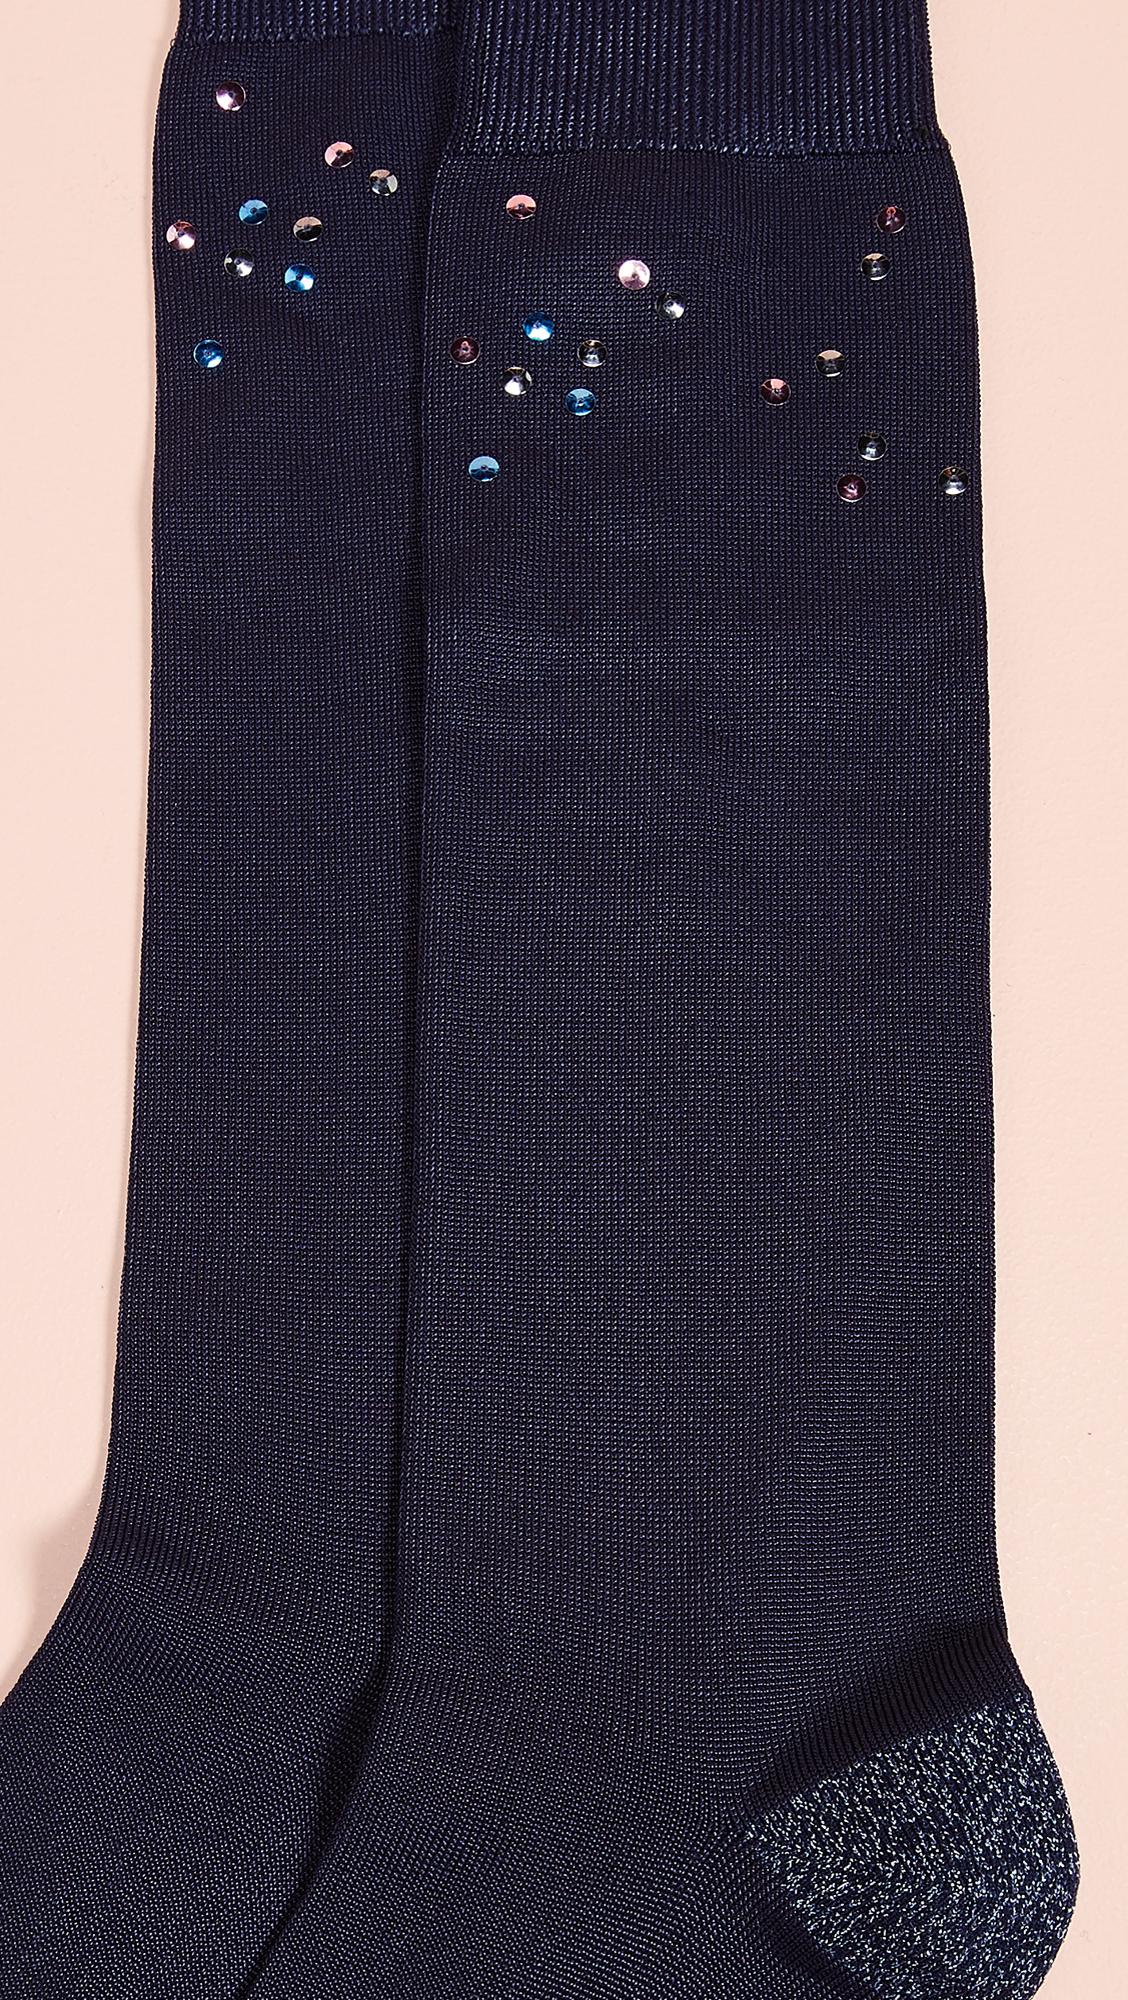 28a9cbf8d64 Hysteria Madda Knee High Socks